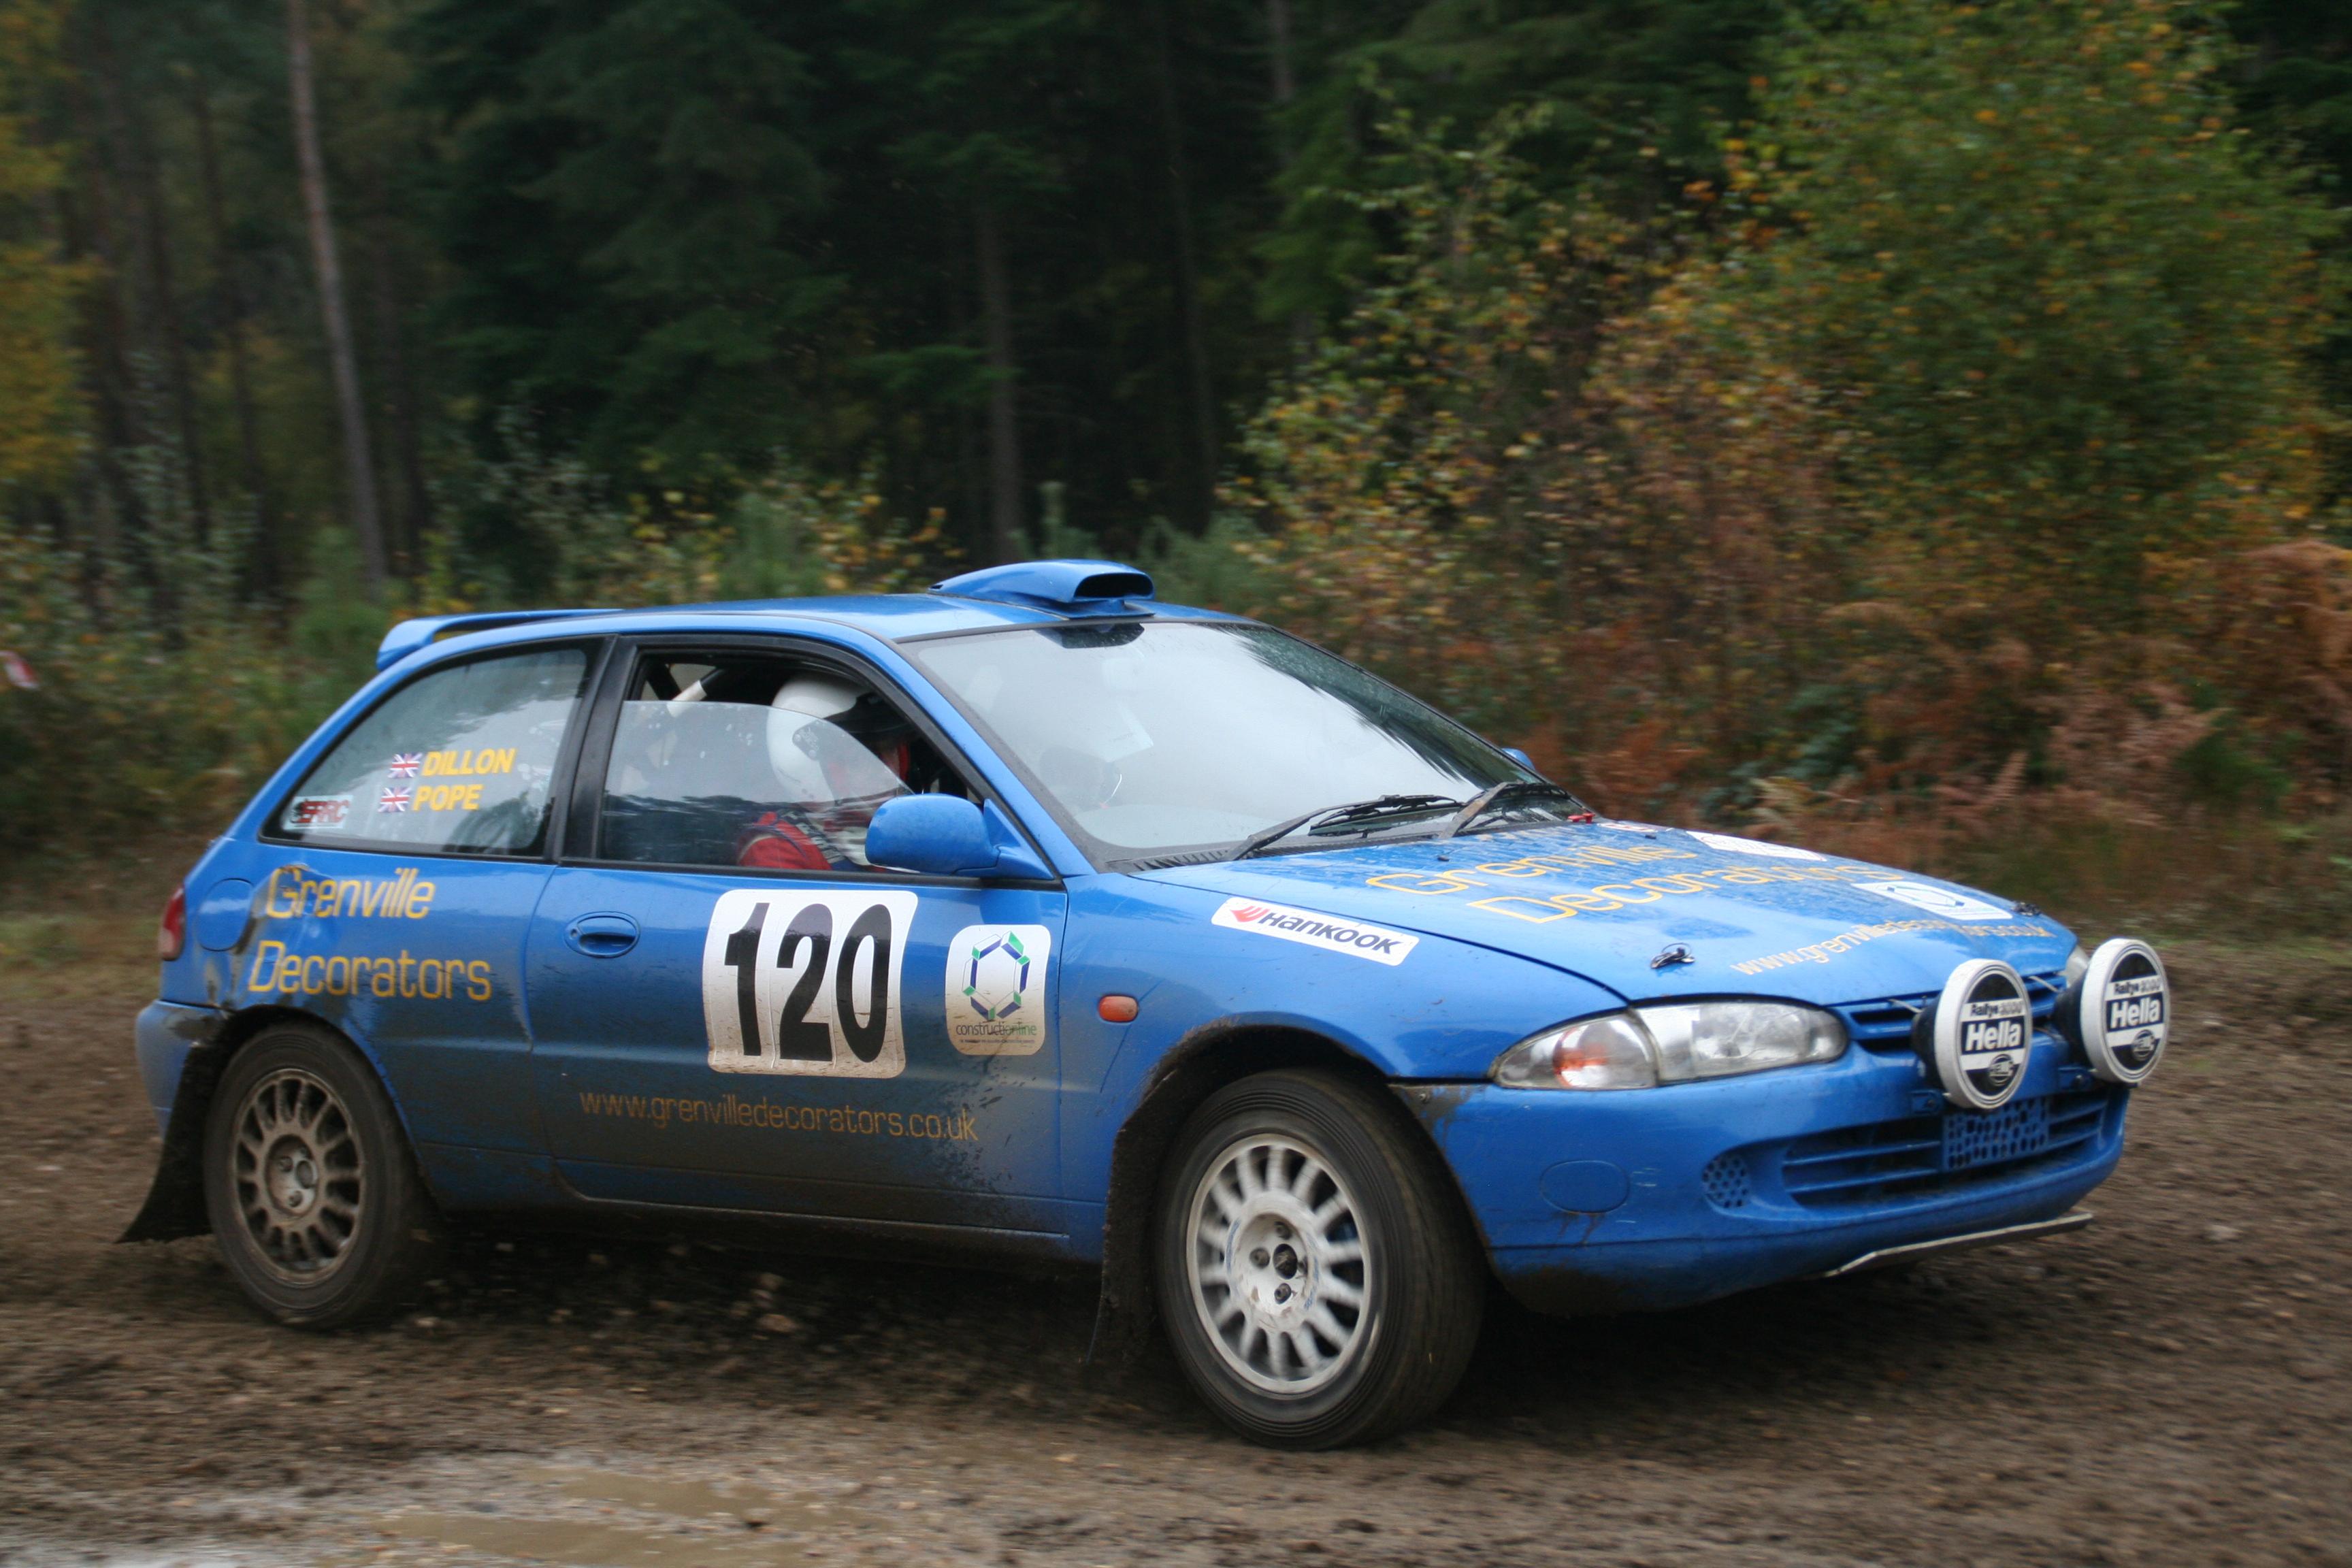 File 1996 Proton Compact 1 6 Rally Car In The United Kingdom 01